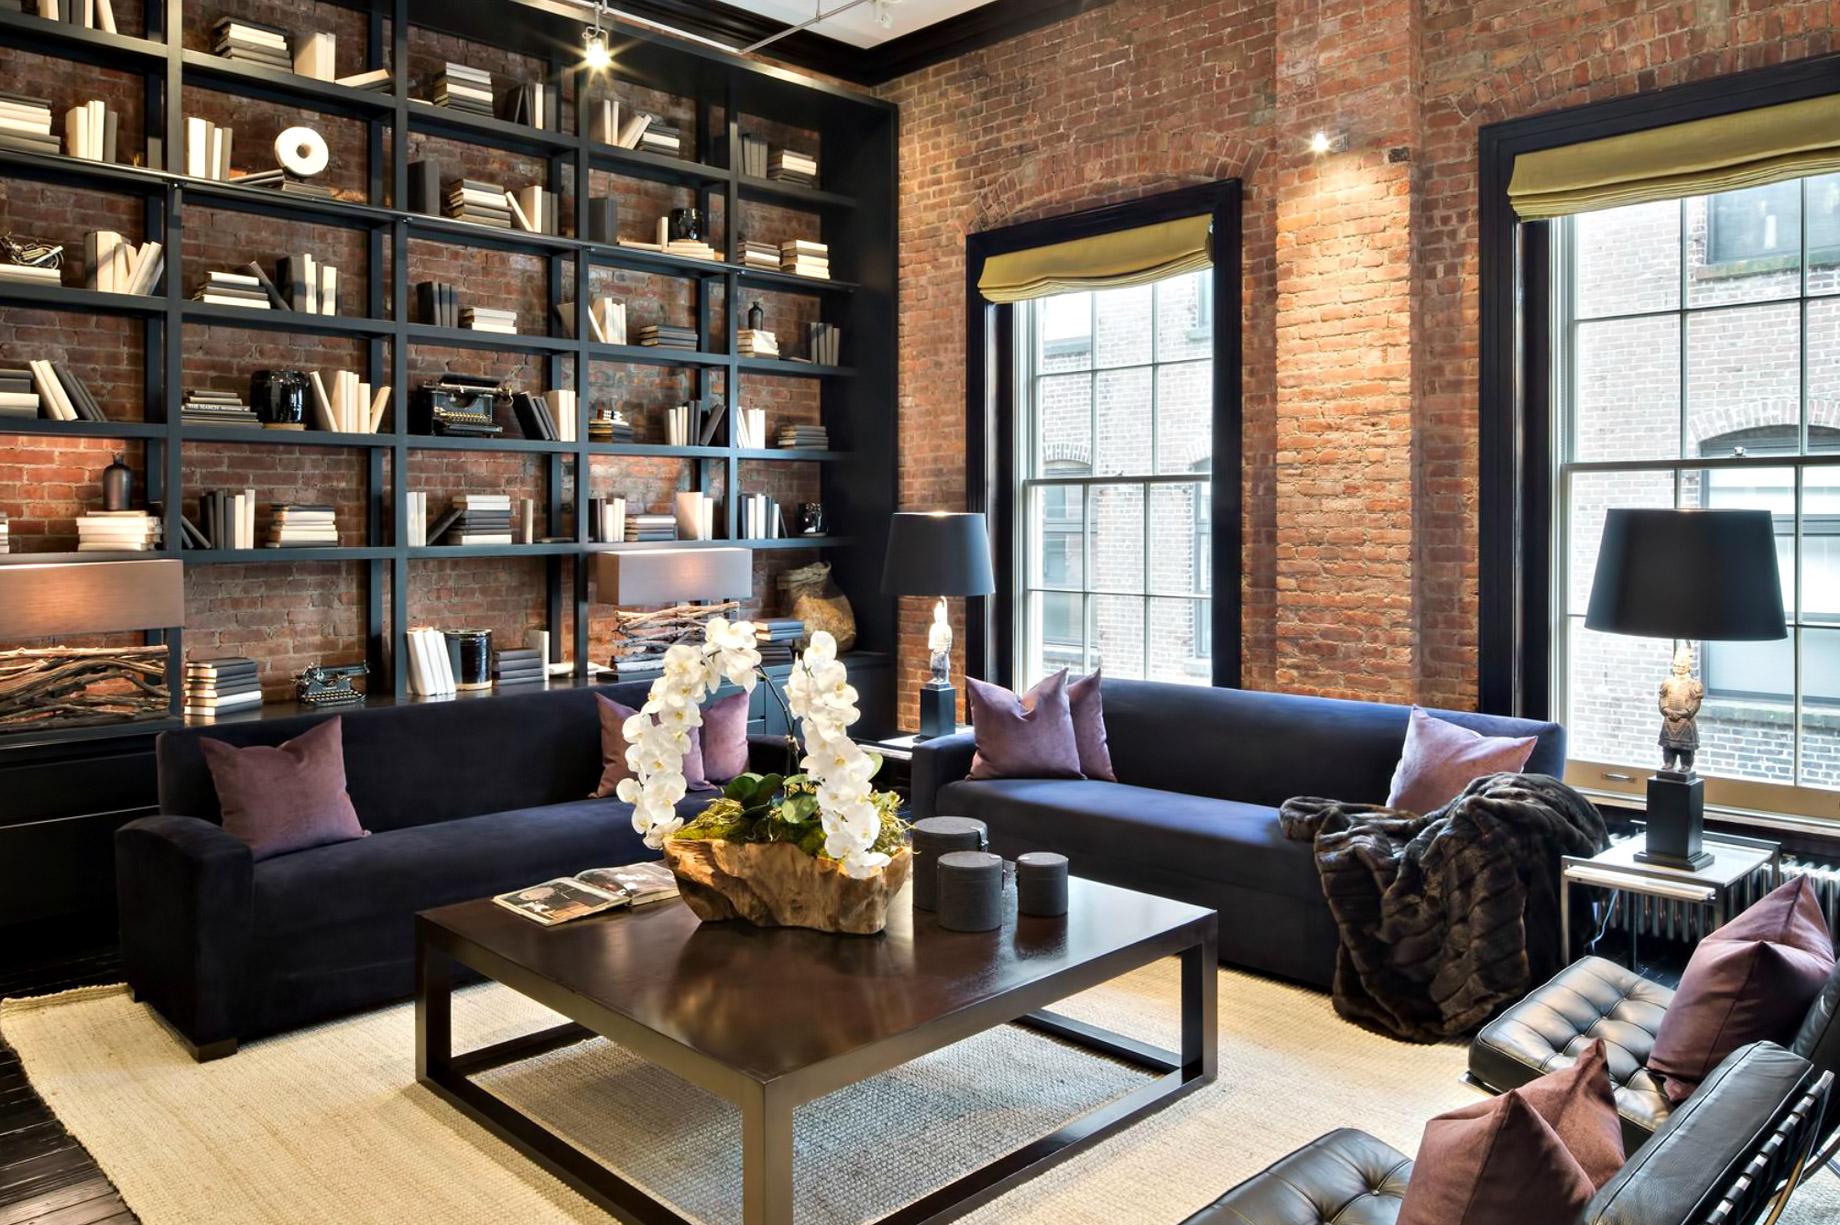 Tribeca Loft Mansion – 144 Duane Street, New York, NY, USA